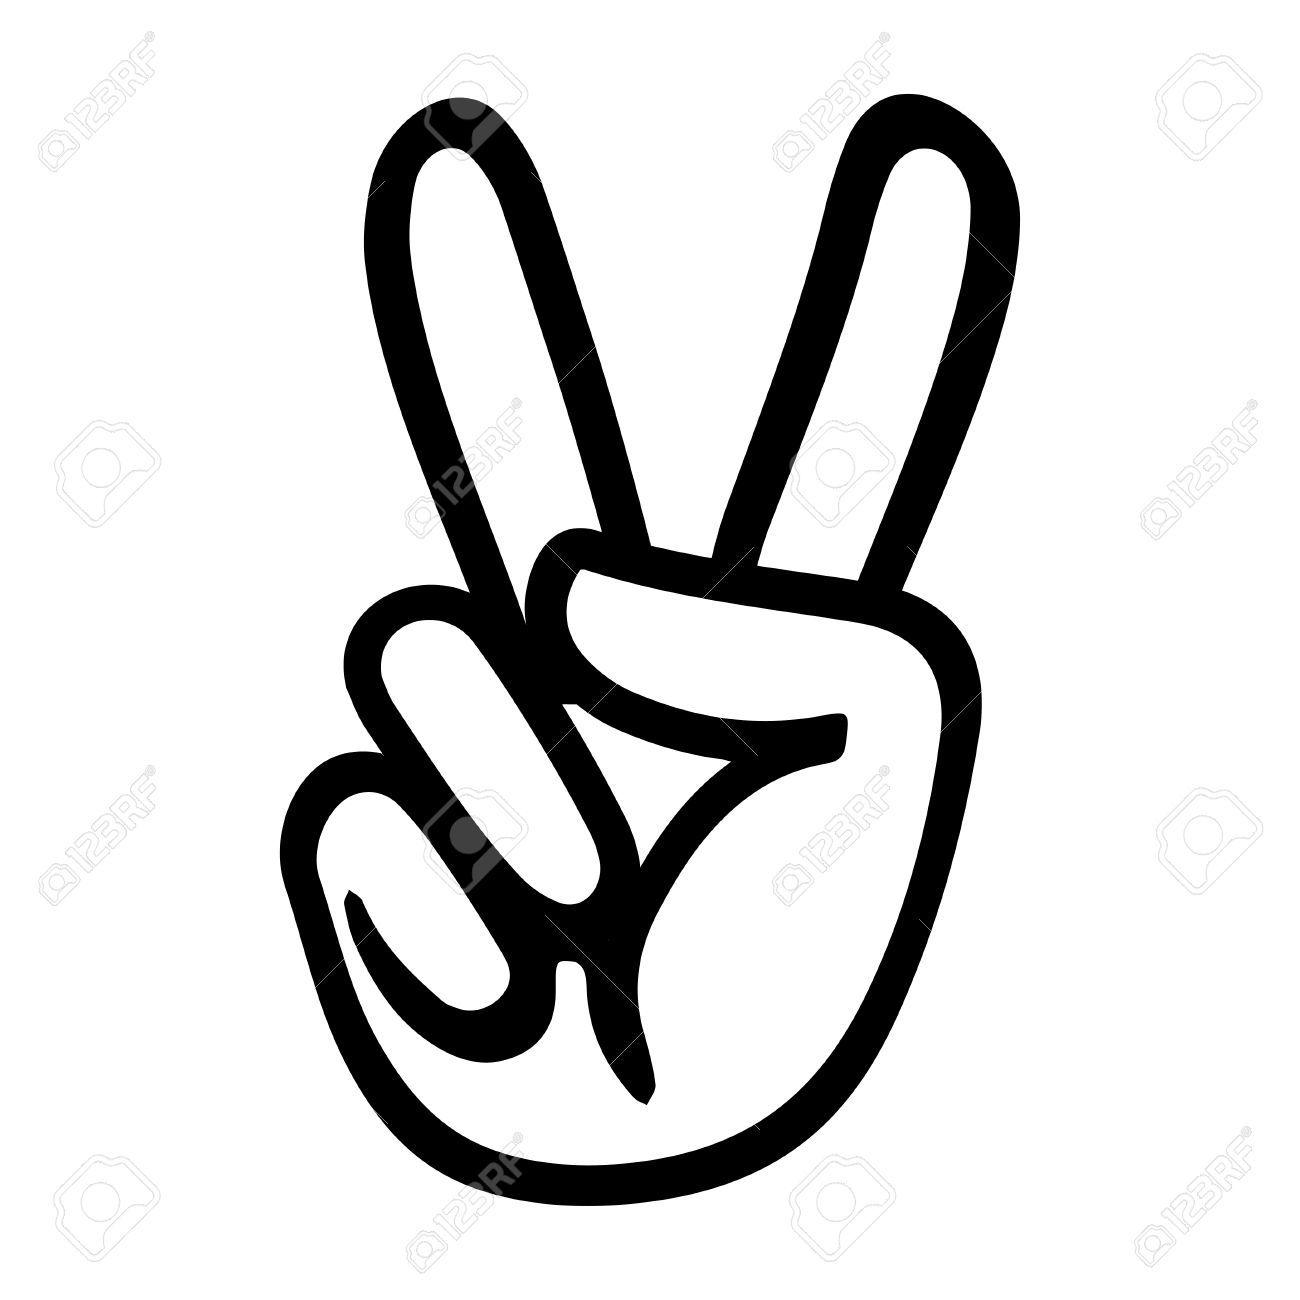 2 finger together clipart royalty free download Two finger clipart 6 » Clipart Portal royalty free download